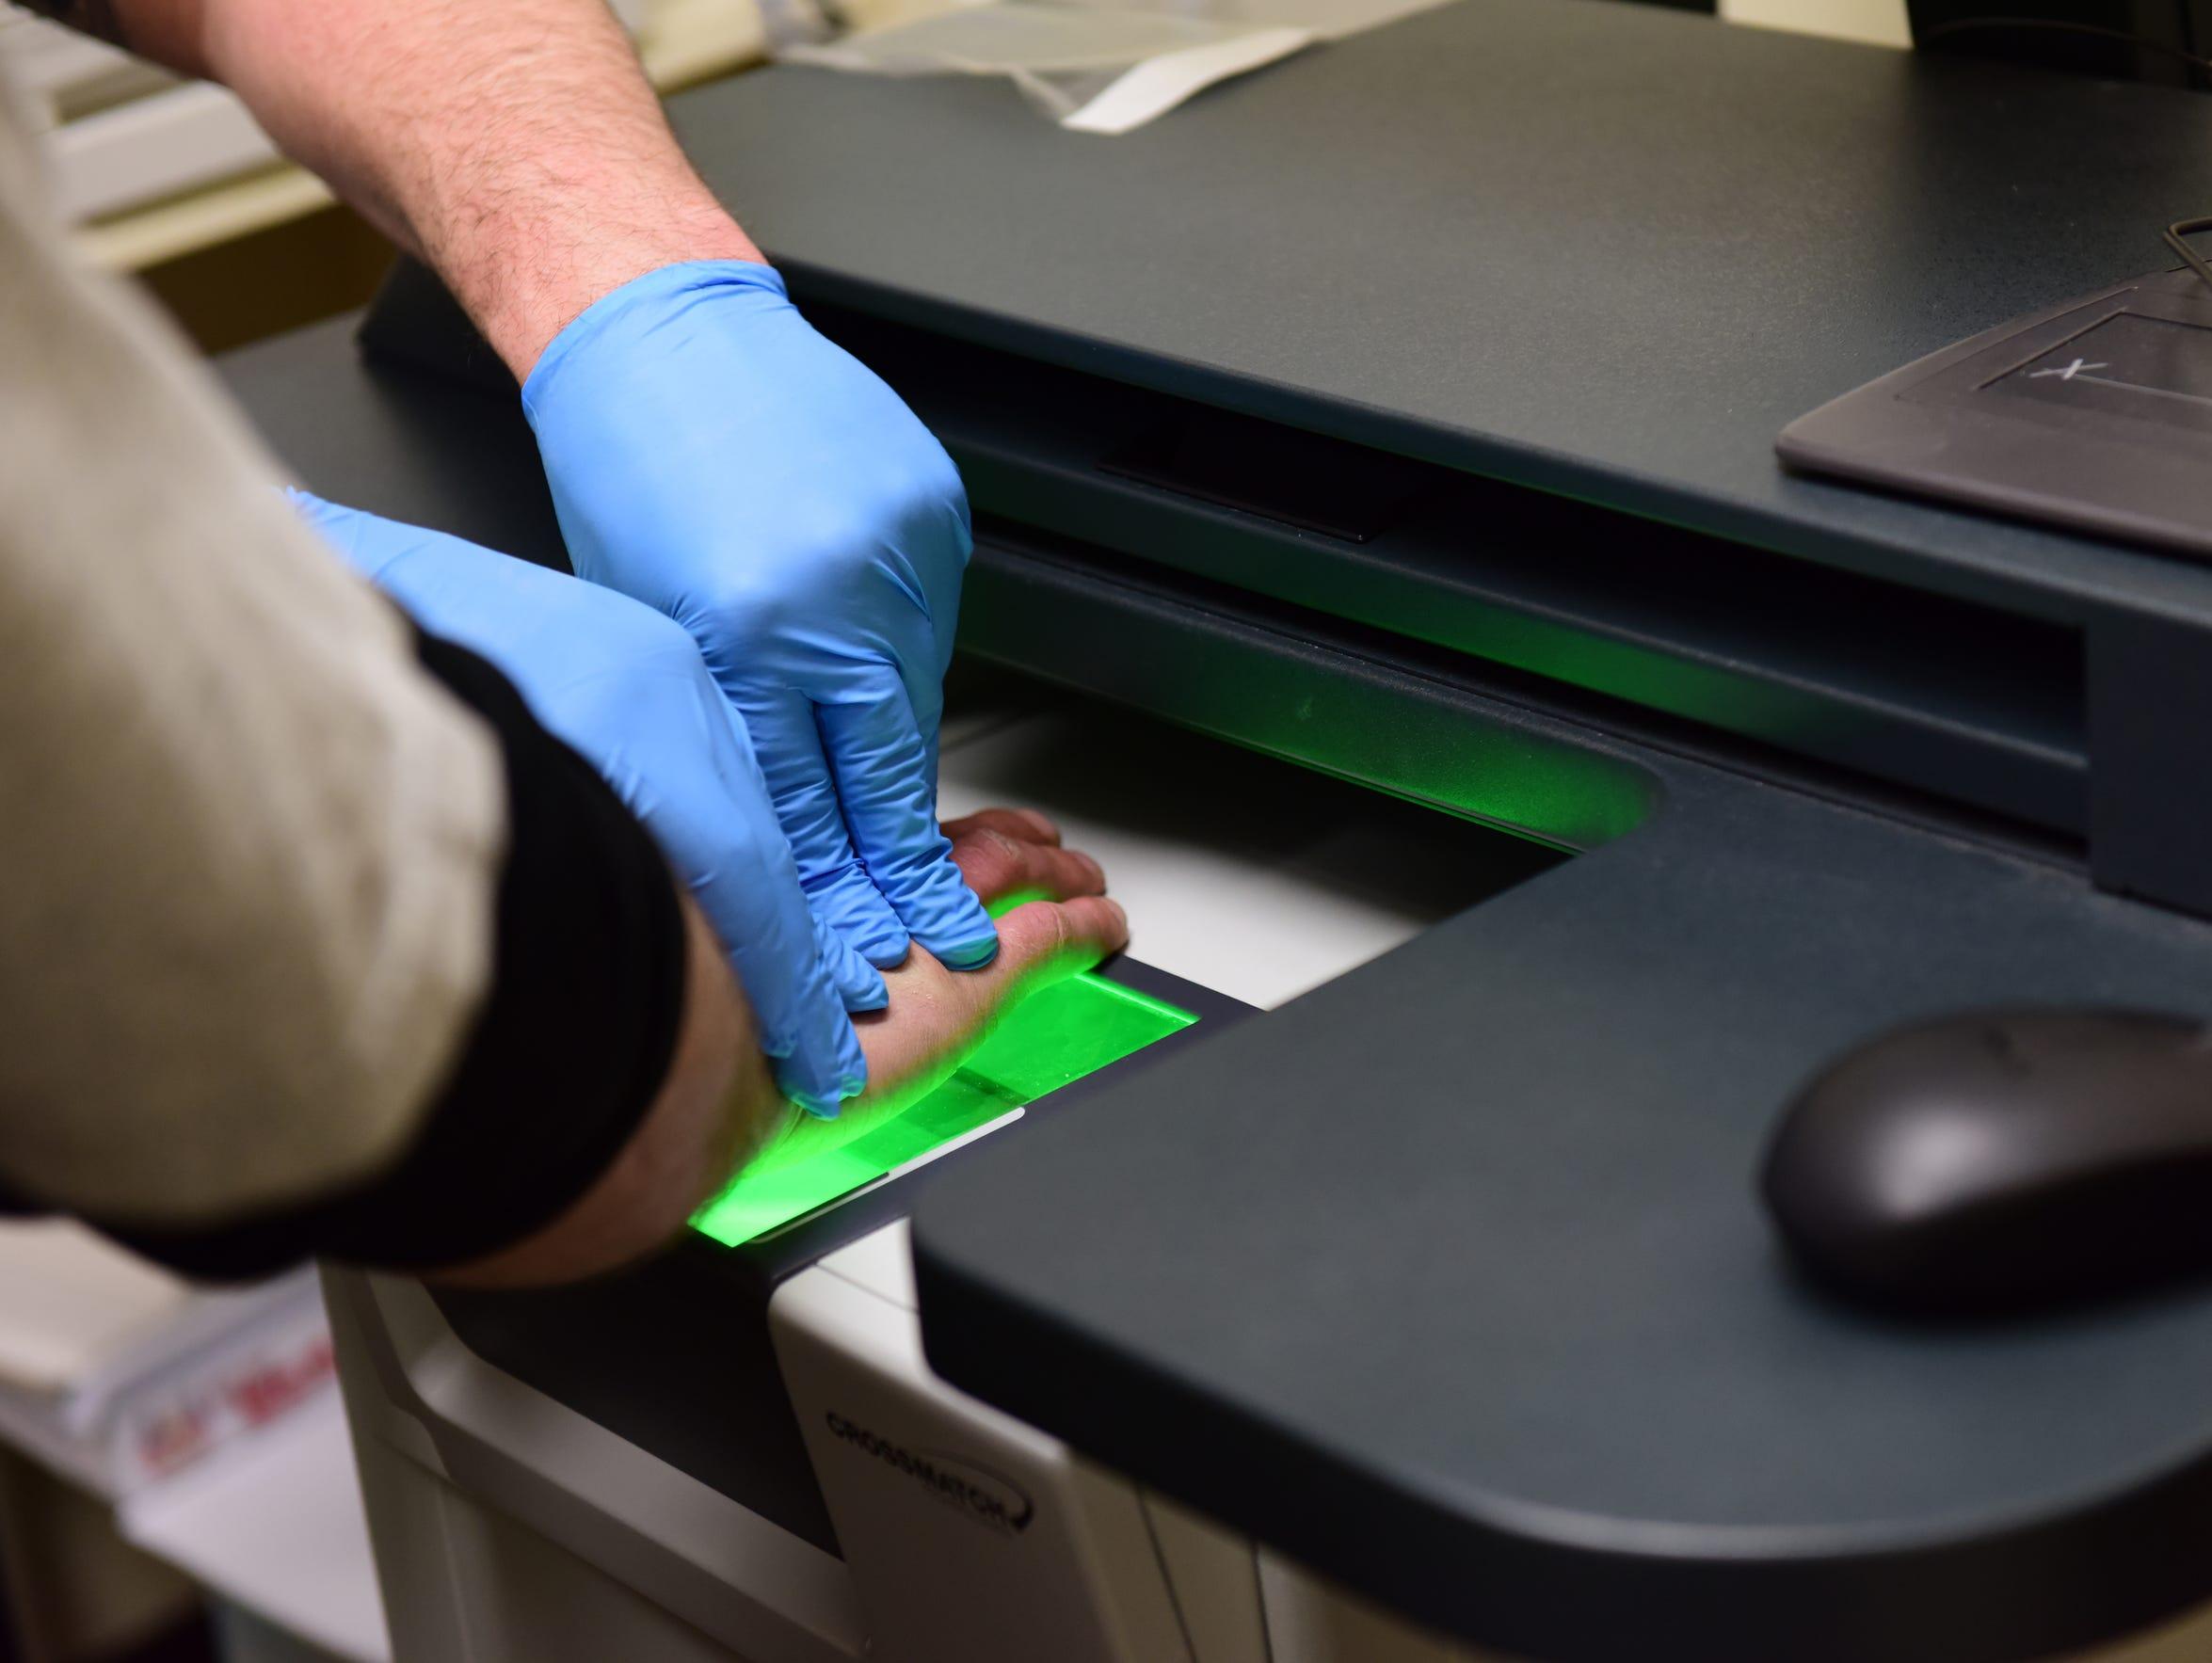 A man is fingerprinted after being arrested for alleged